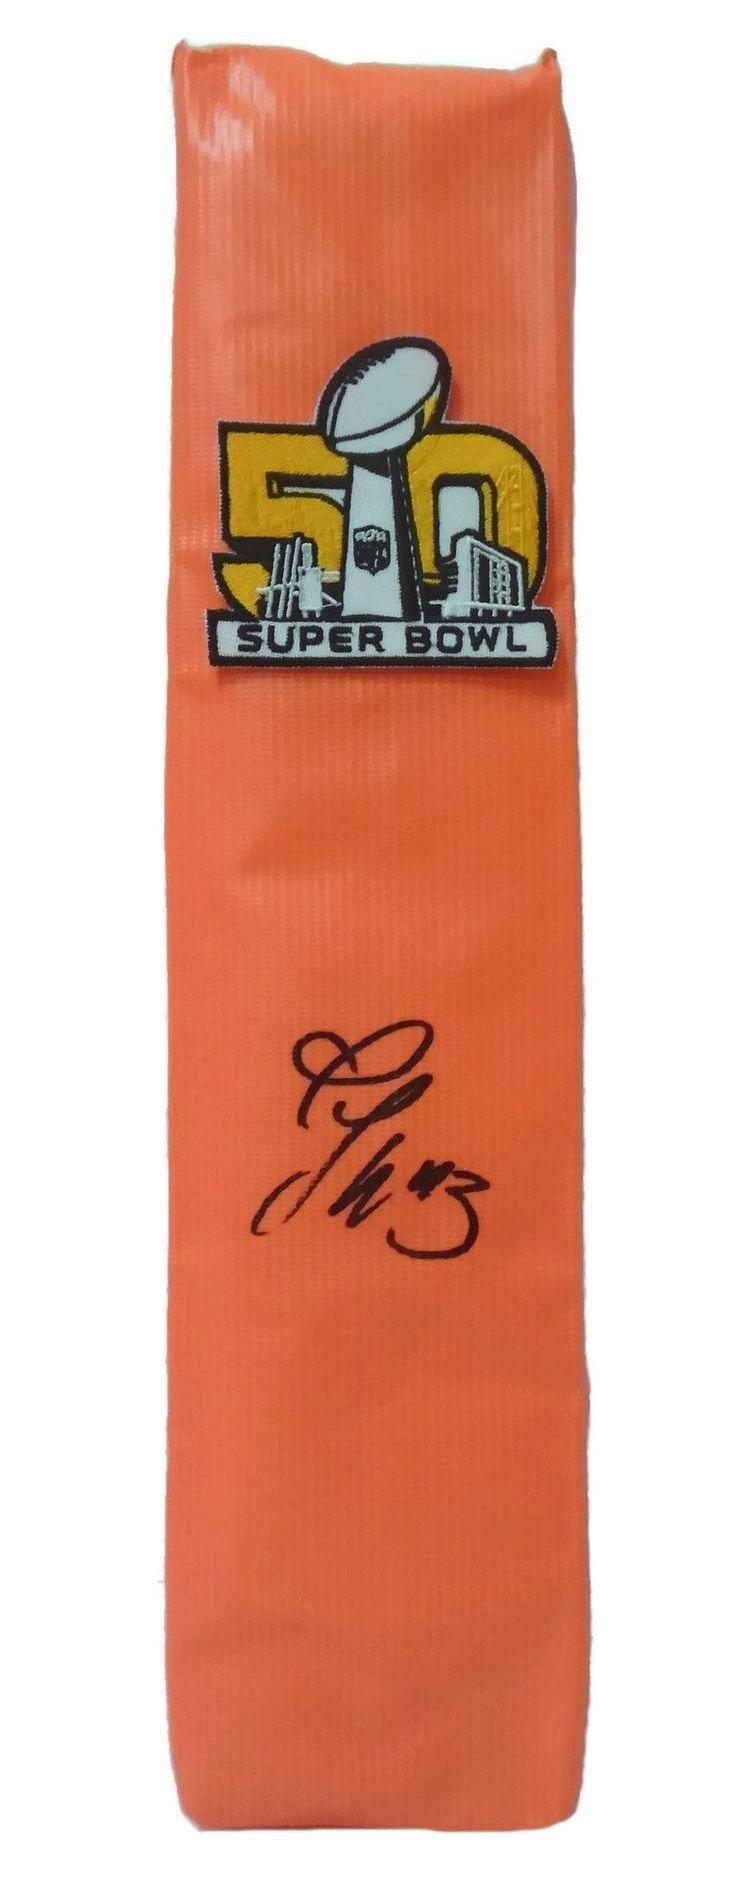 T.J. Ward Autographed Denver Broncos SB 50 Full Size Football End Zone Touchdown Pylon, Proof